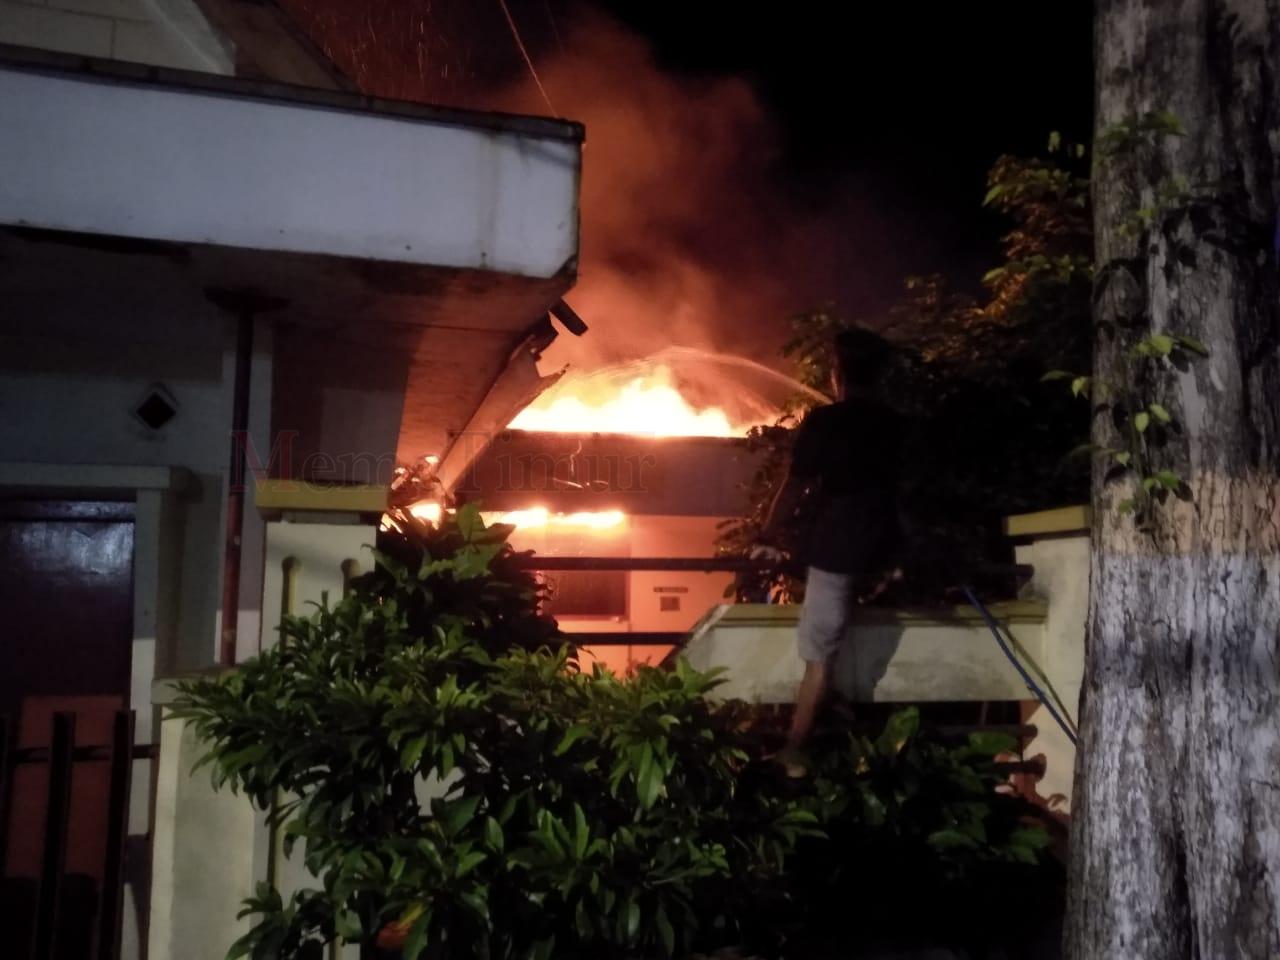 Kebakaran Kerap Dipicu Korsleting Listrik, PLN Himbau Warga Cek Instalasi